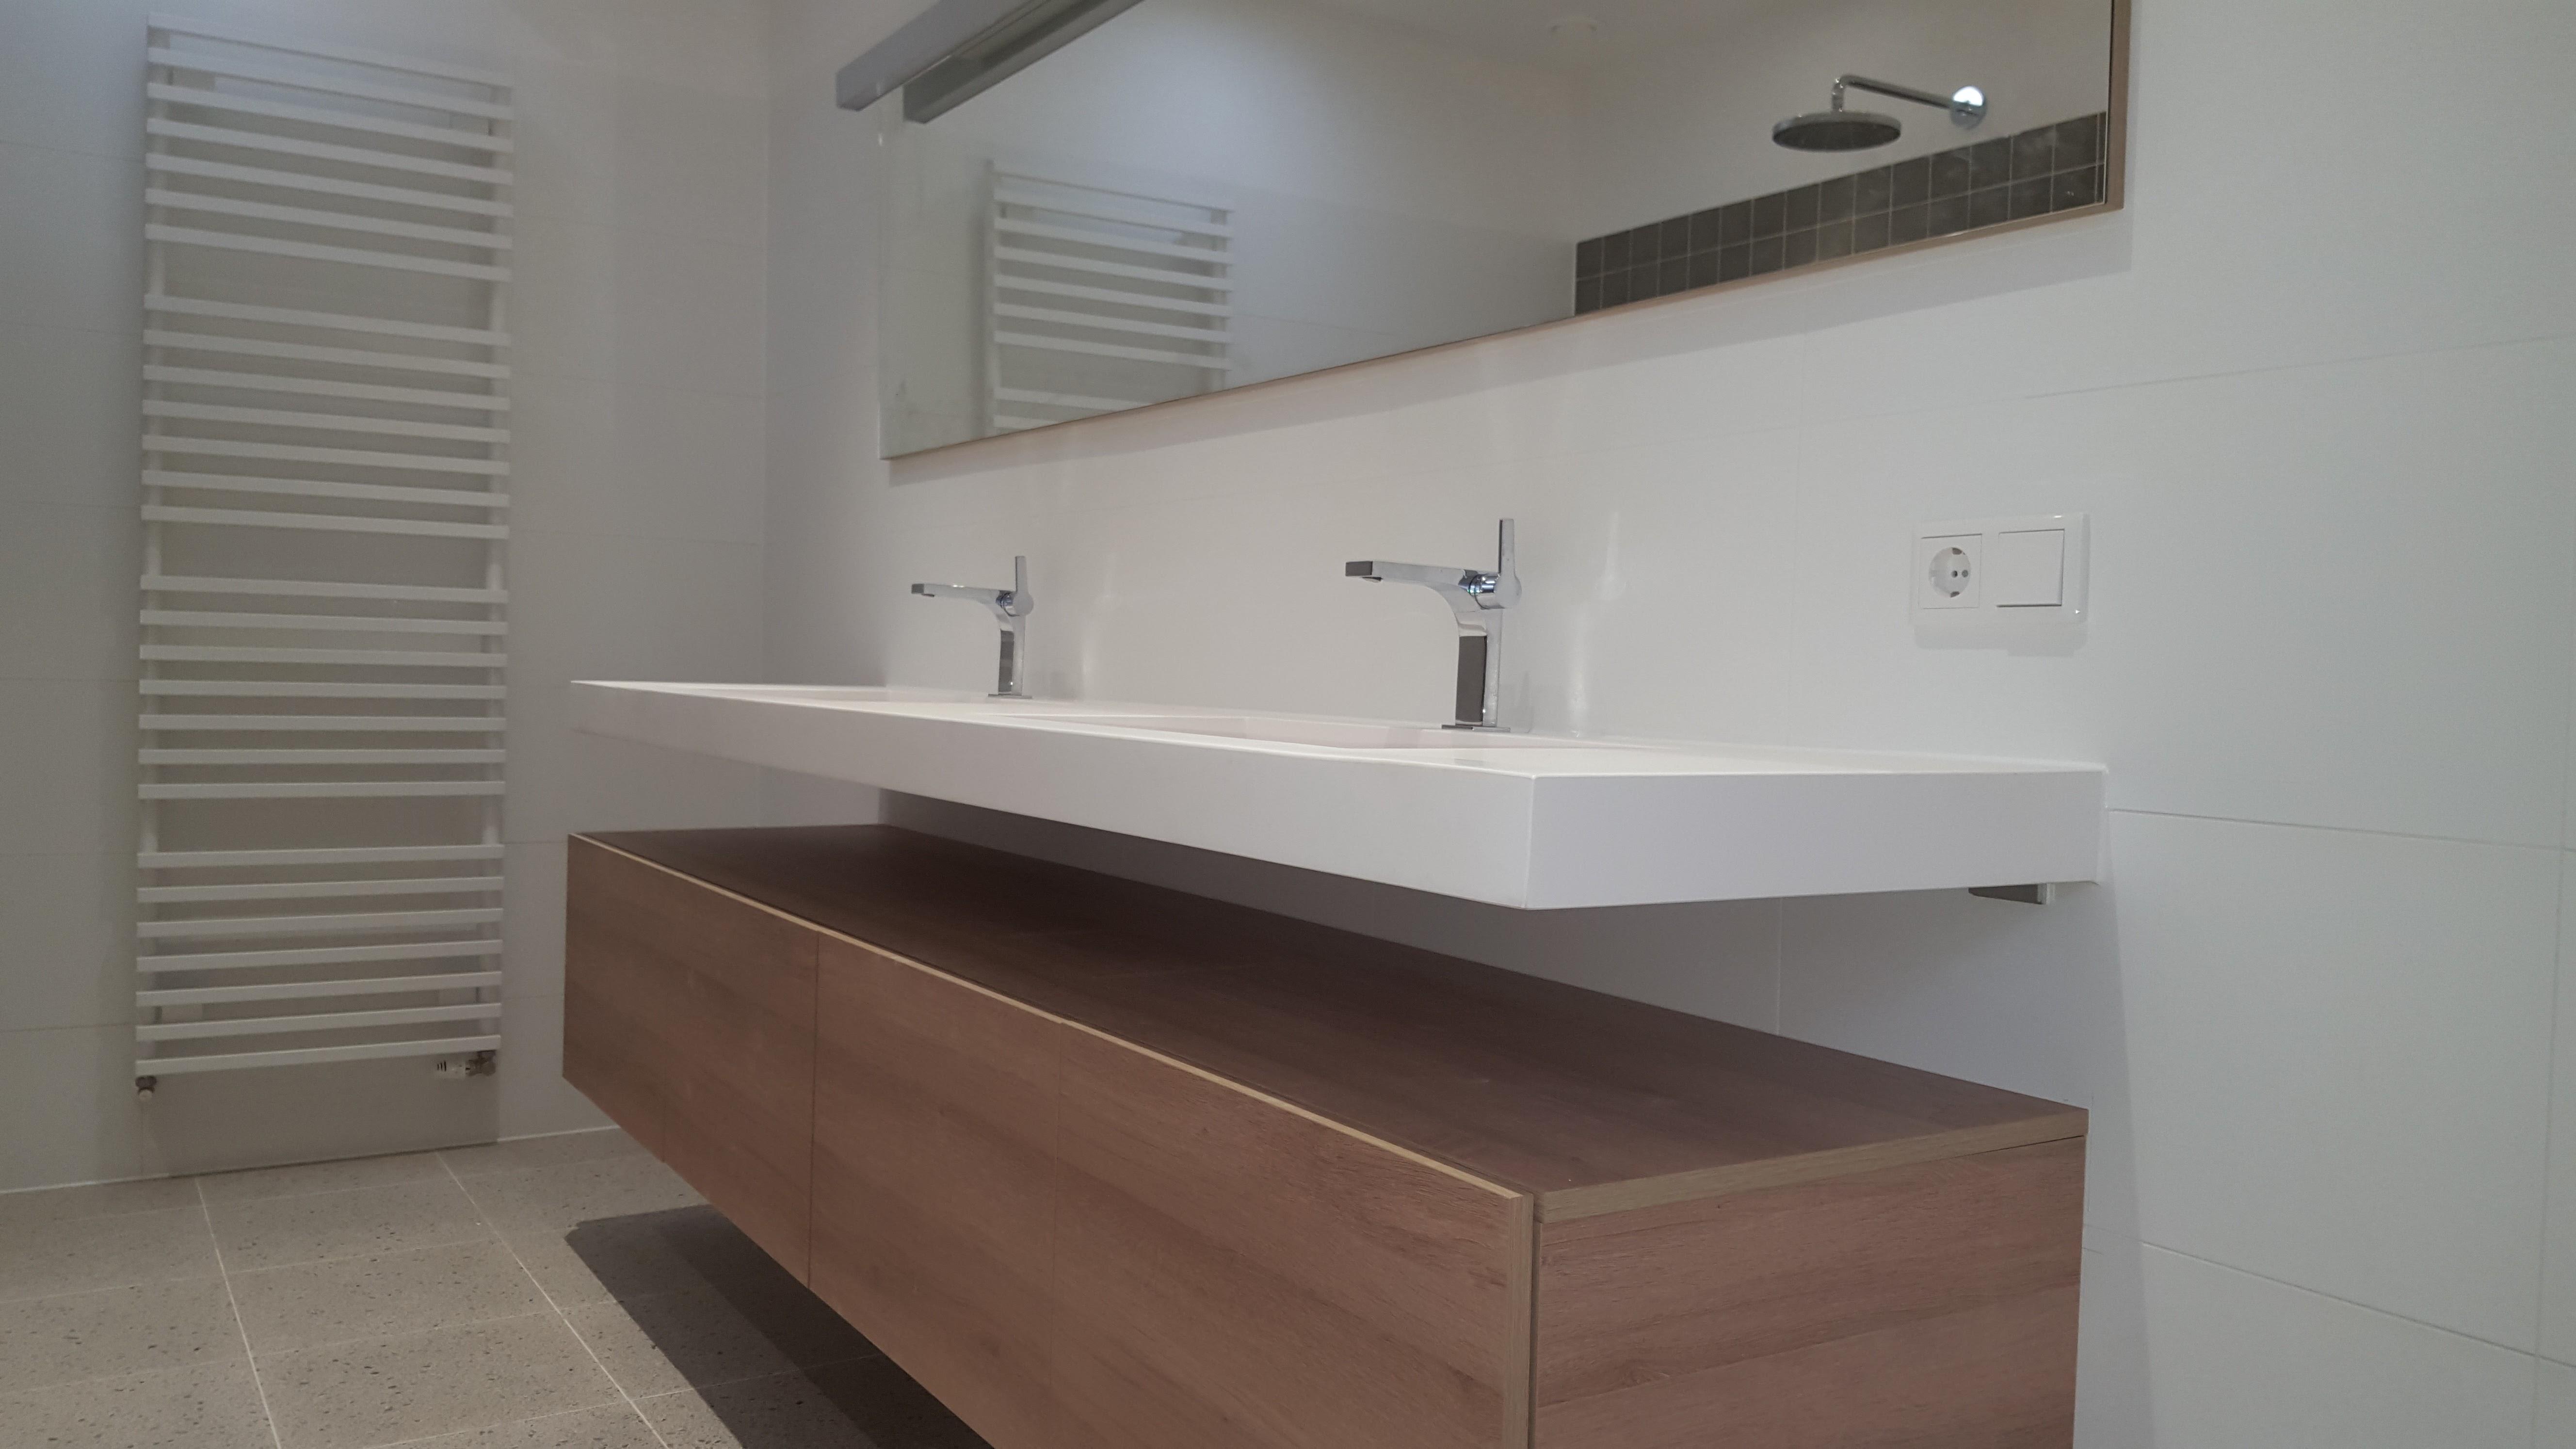 Badkamer Wasbak Kom : Emejing badkamer wasbak ideas new home design 2018